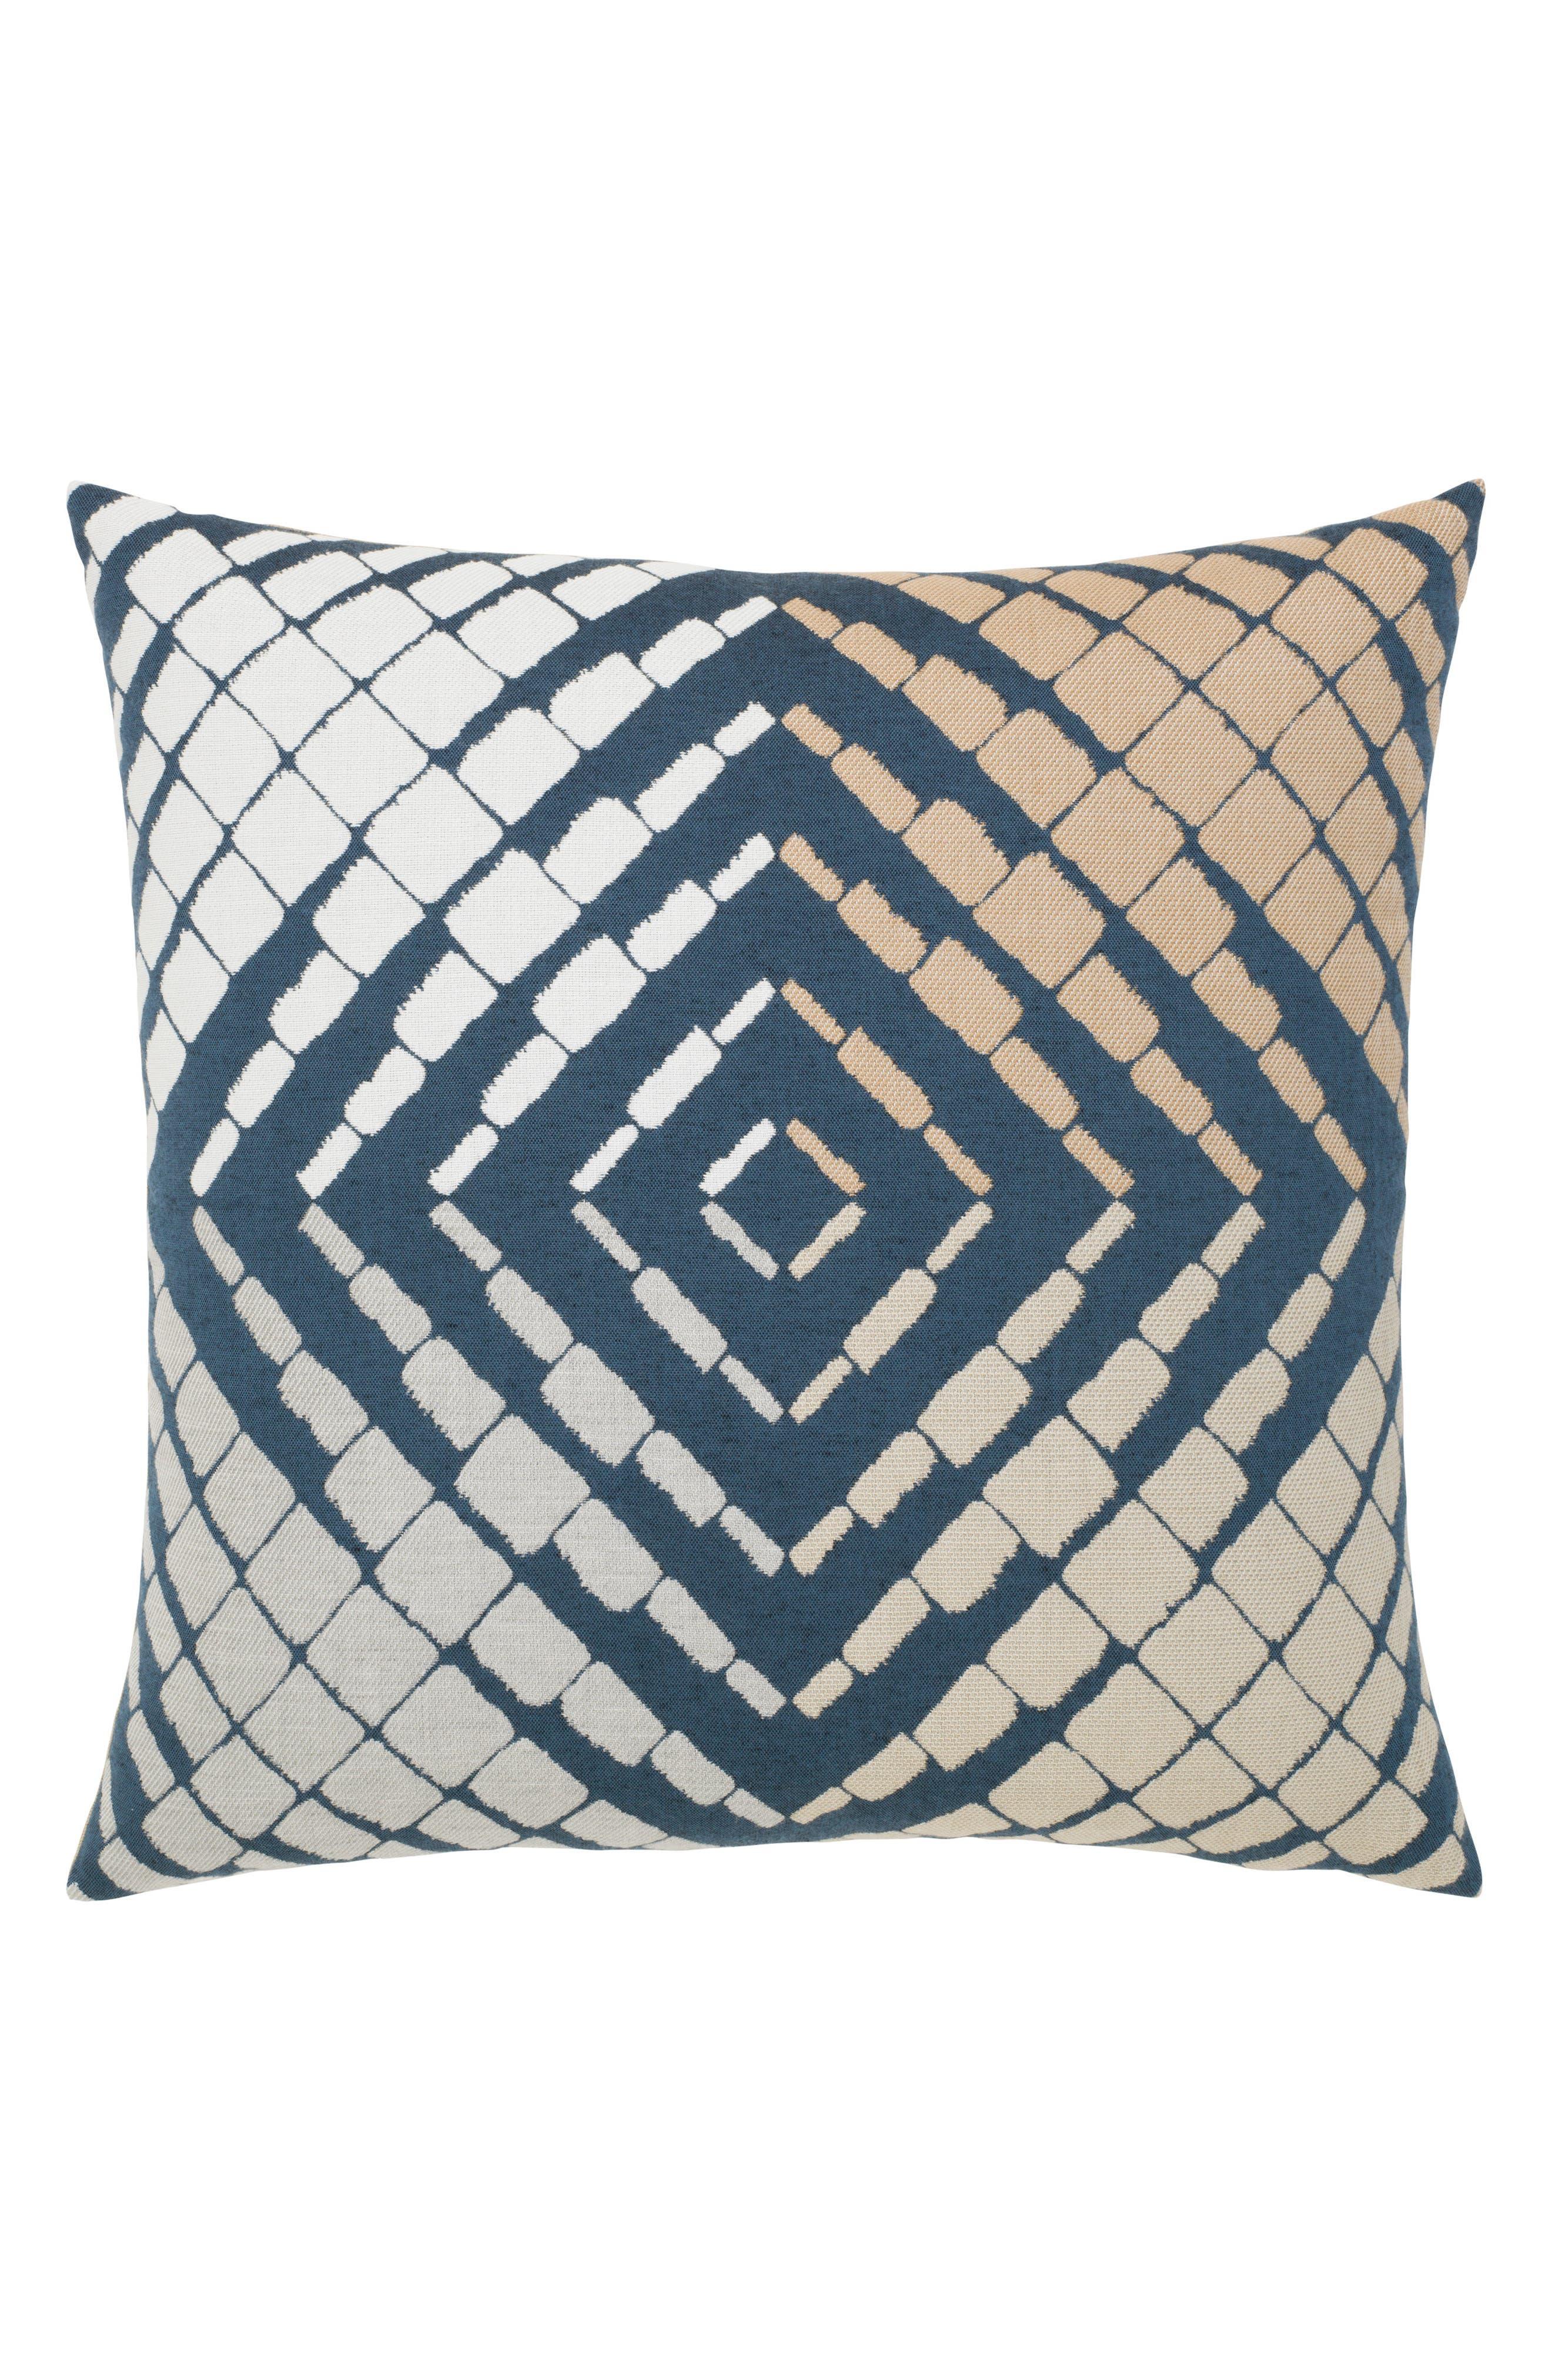 Elaine Smith Progression Accent Pillow